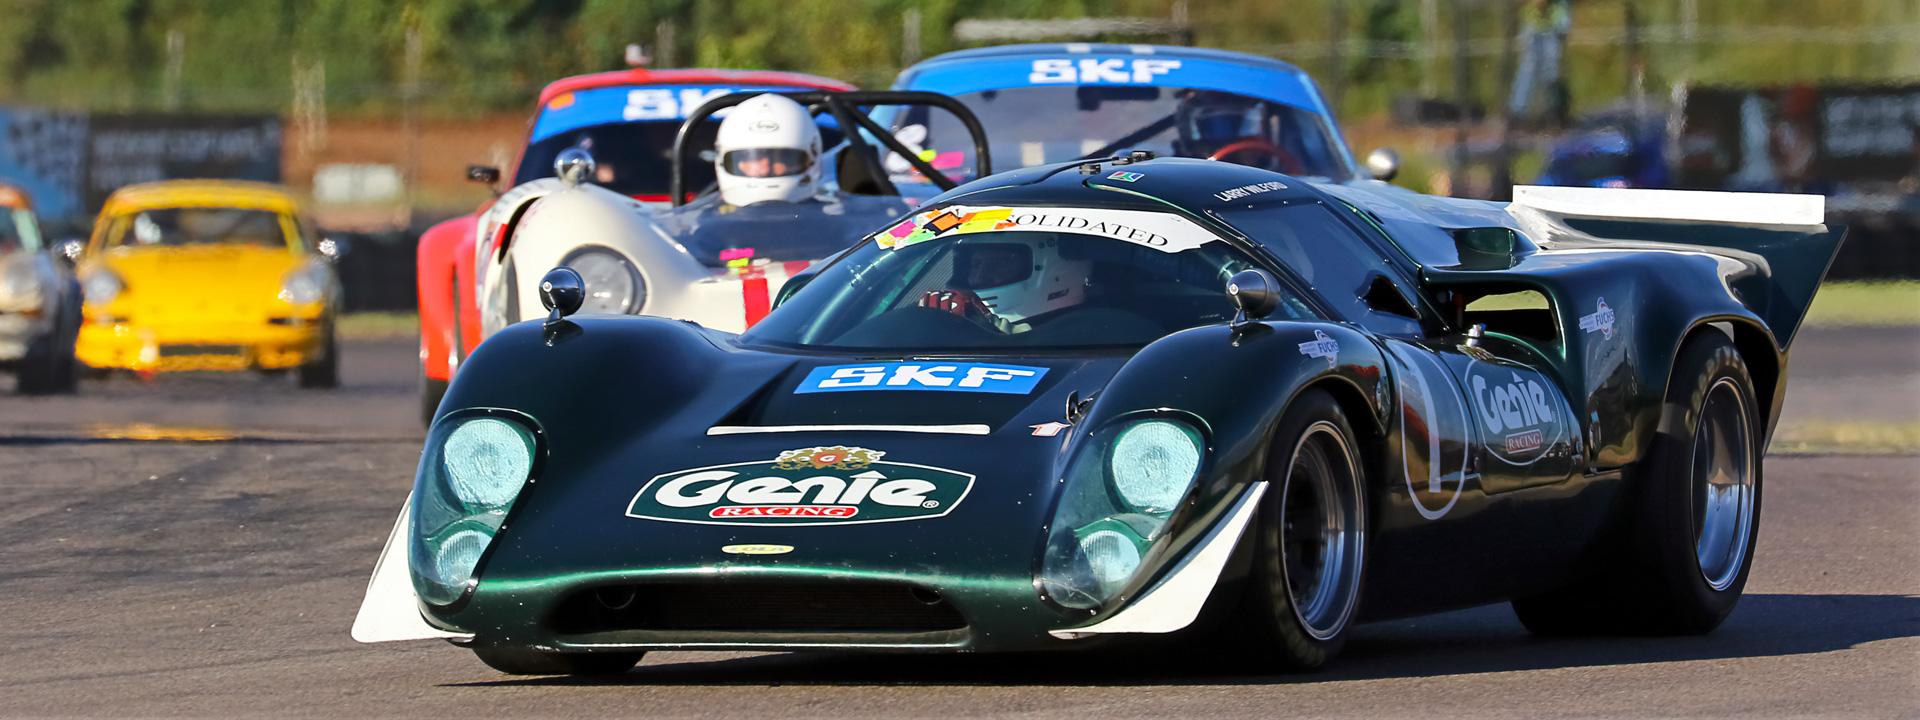 Historic car racing returns to Zwartkops Raceway - 29 September 2018